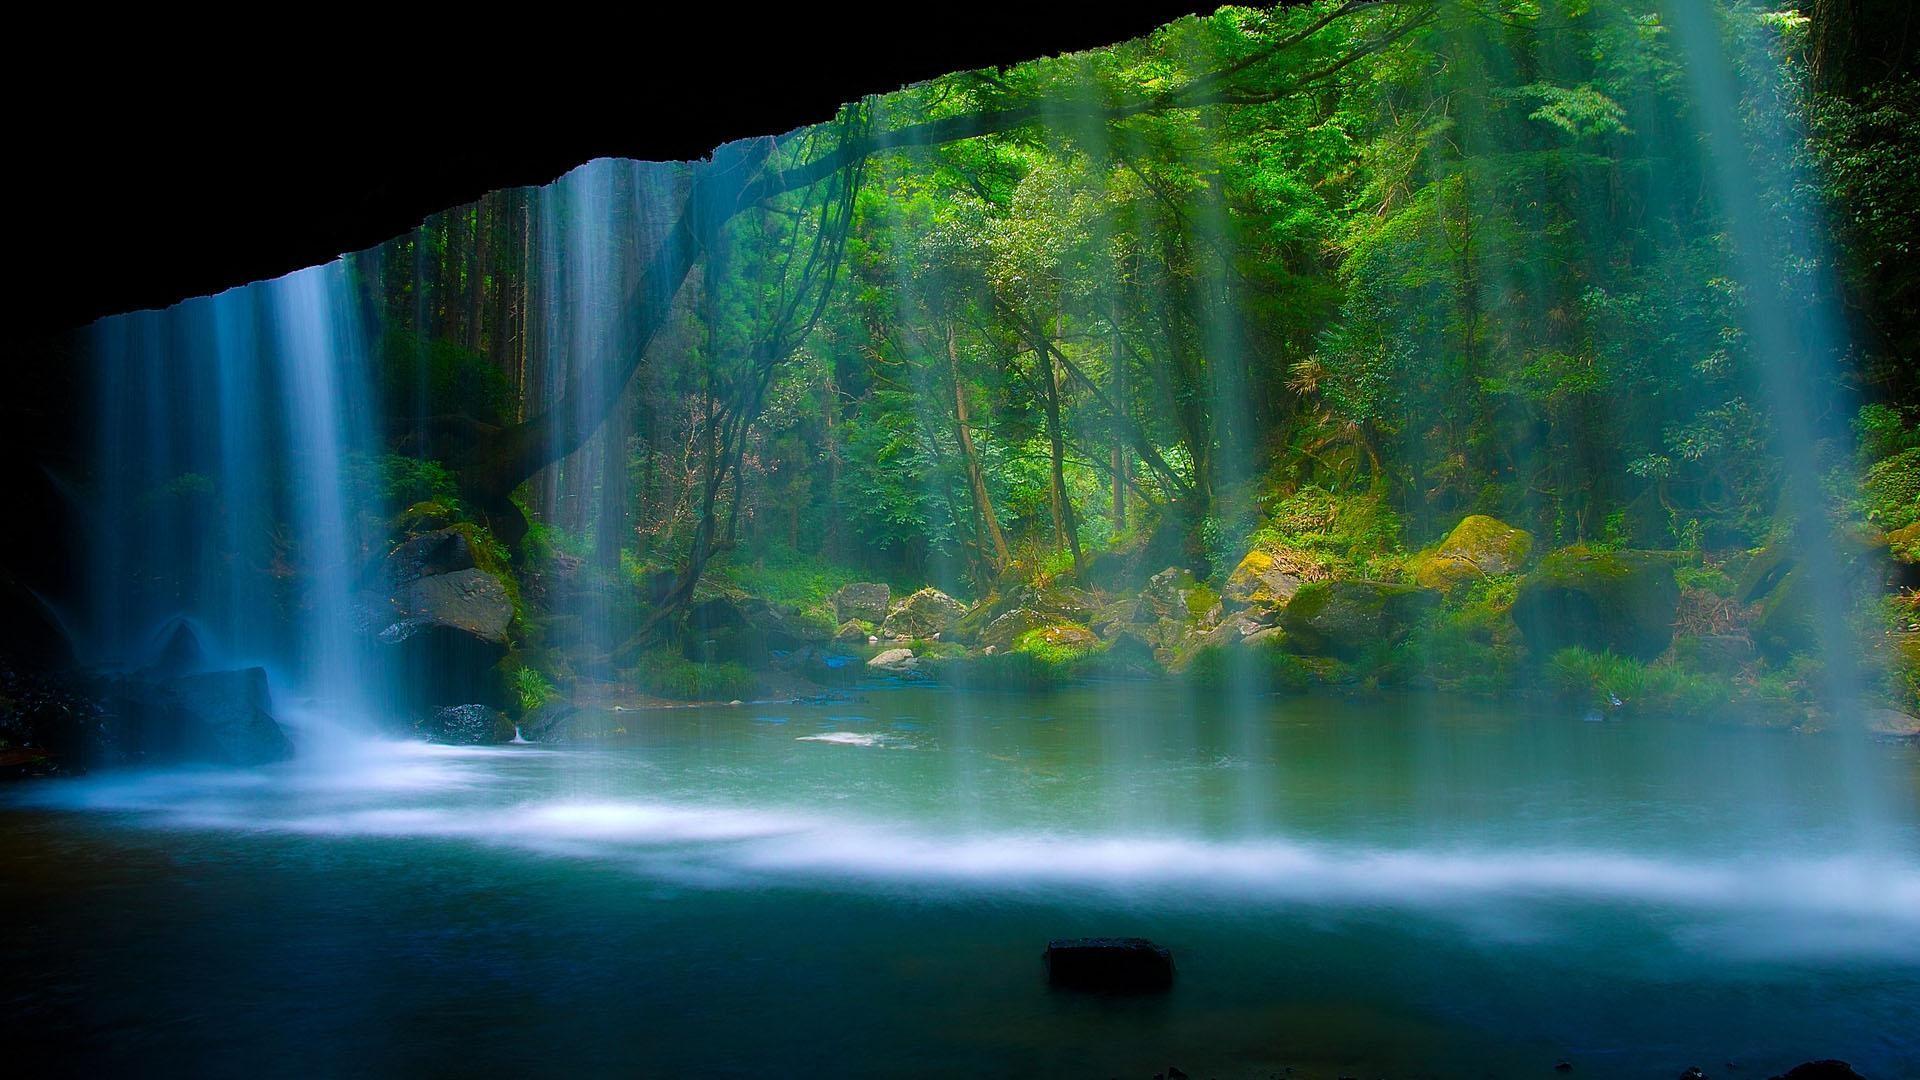 Background Desktop Computer Sun Widescreen Waterfall Nice Picture .